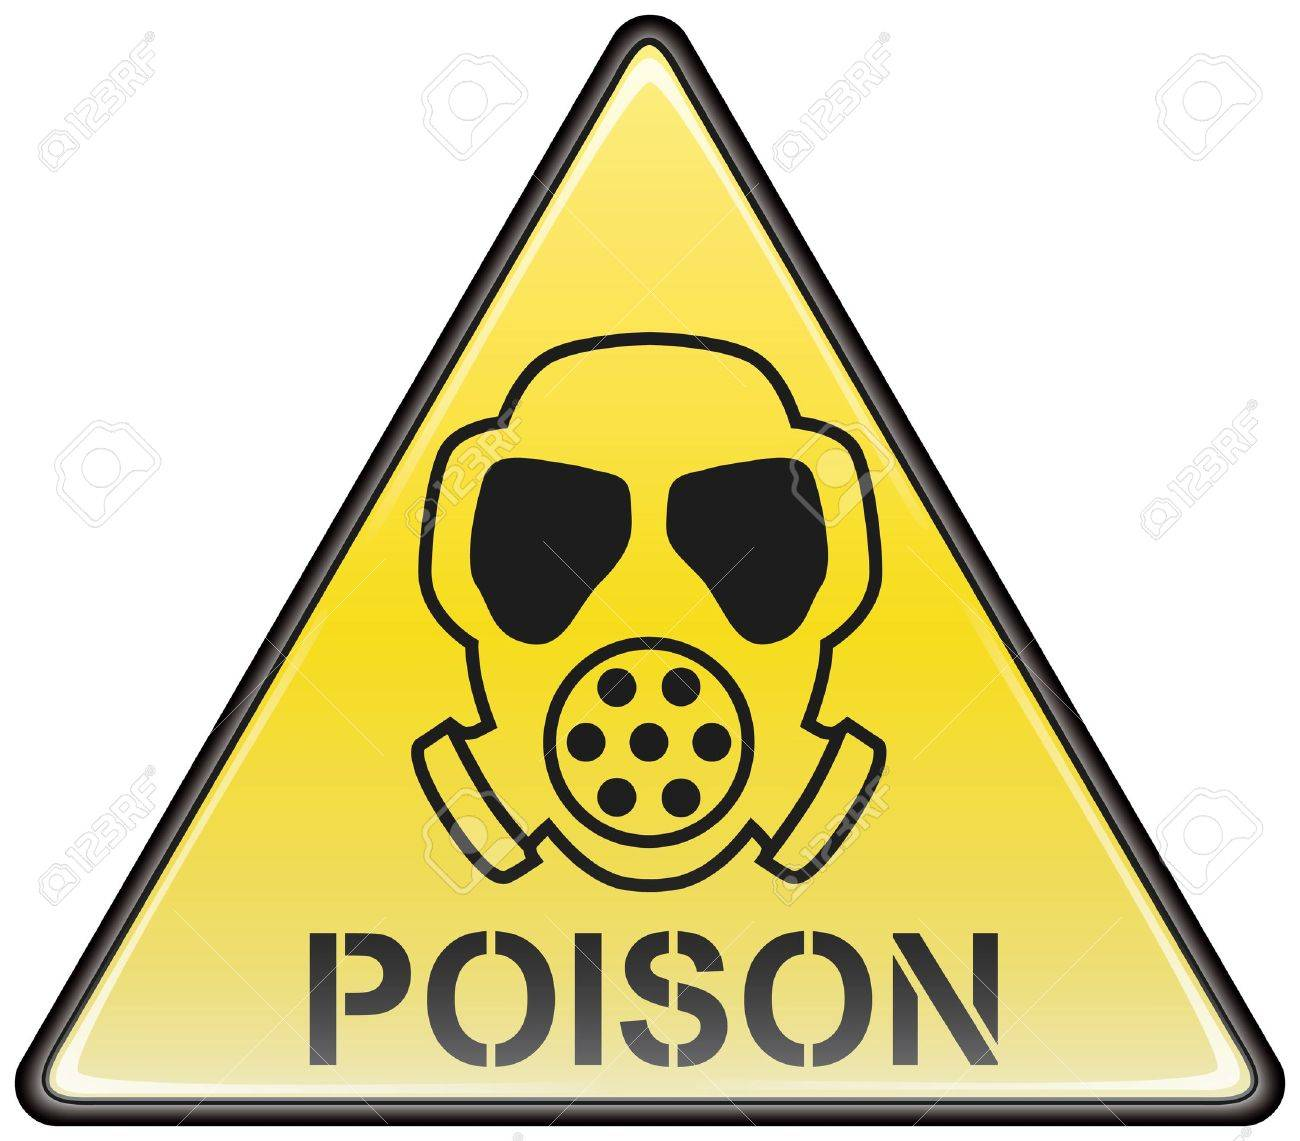 Poison gas mask vector triangle hazardous sign - 8504311